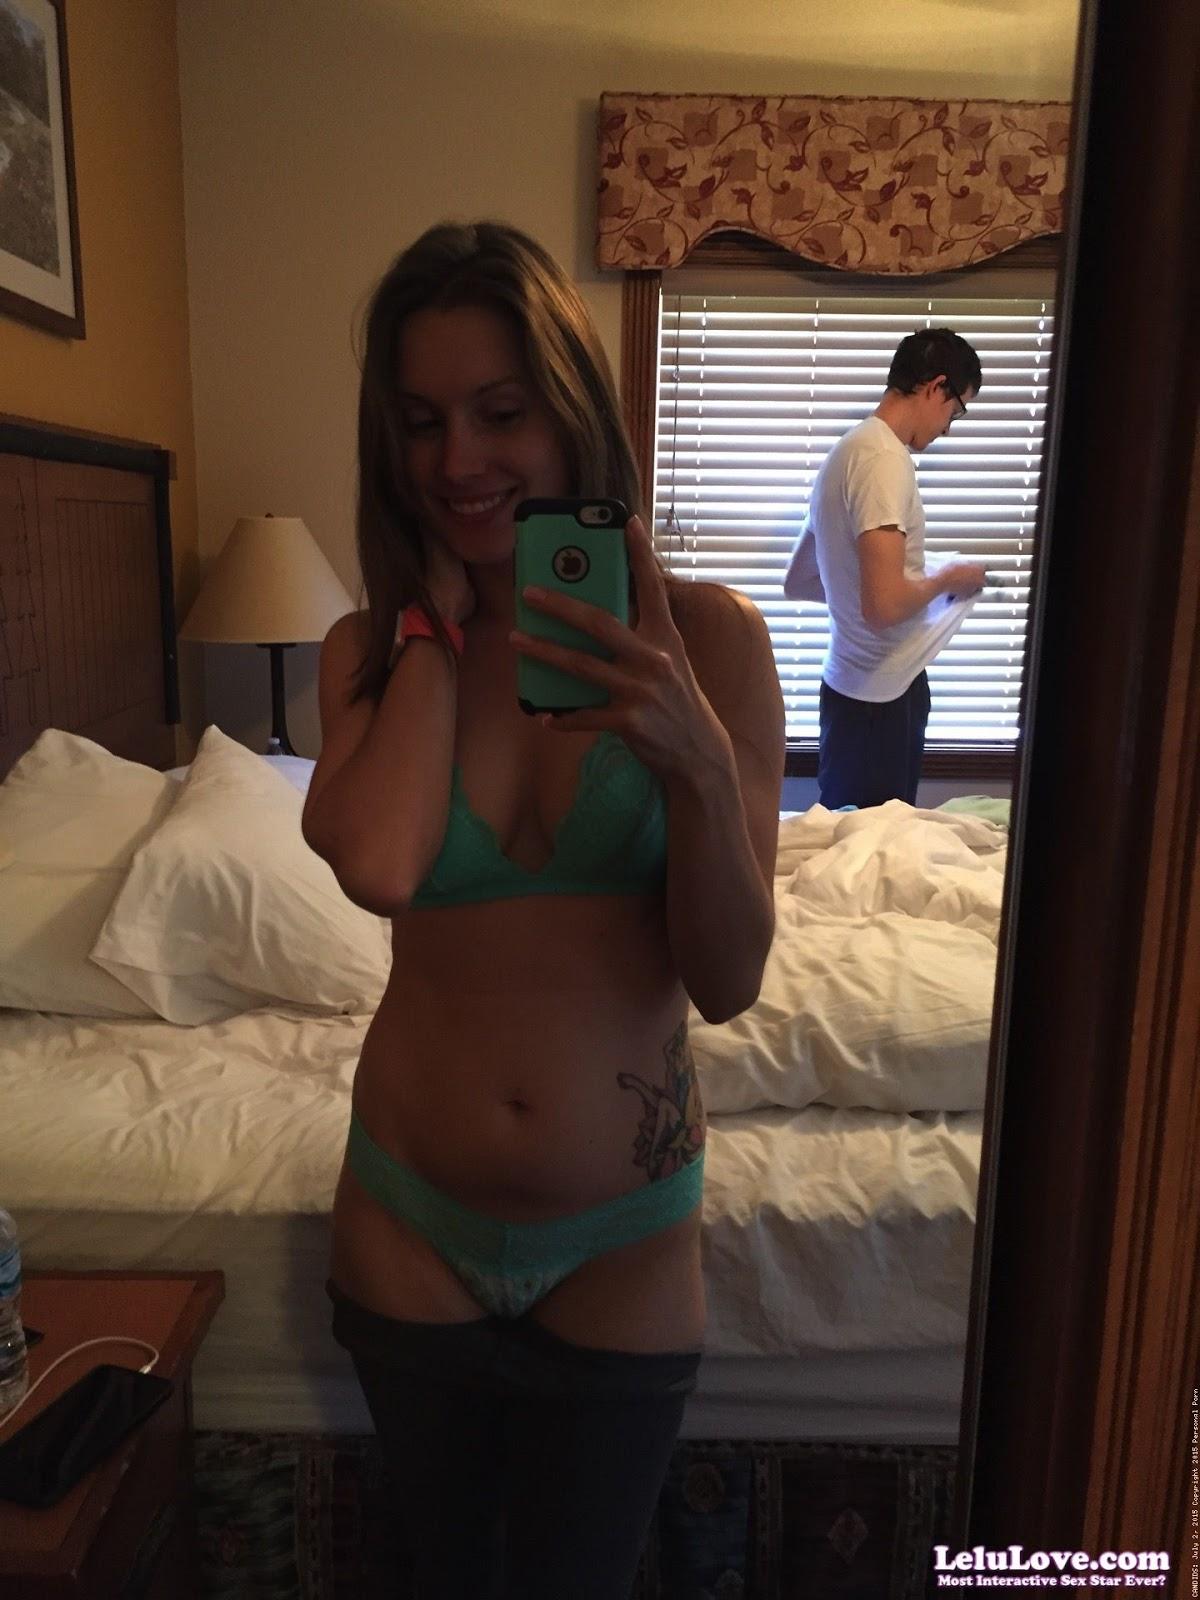 Lelu lovewebcam pregnancy updates masturbation cum play ta 6